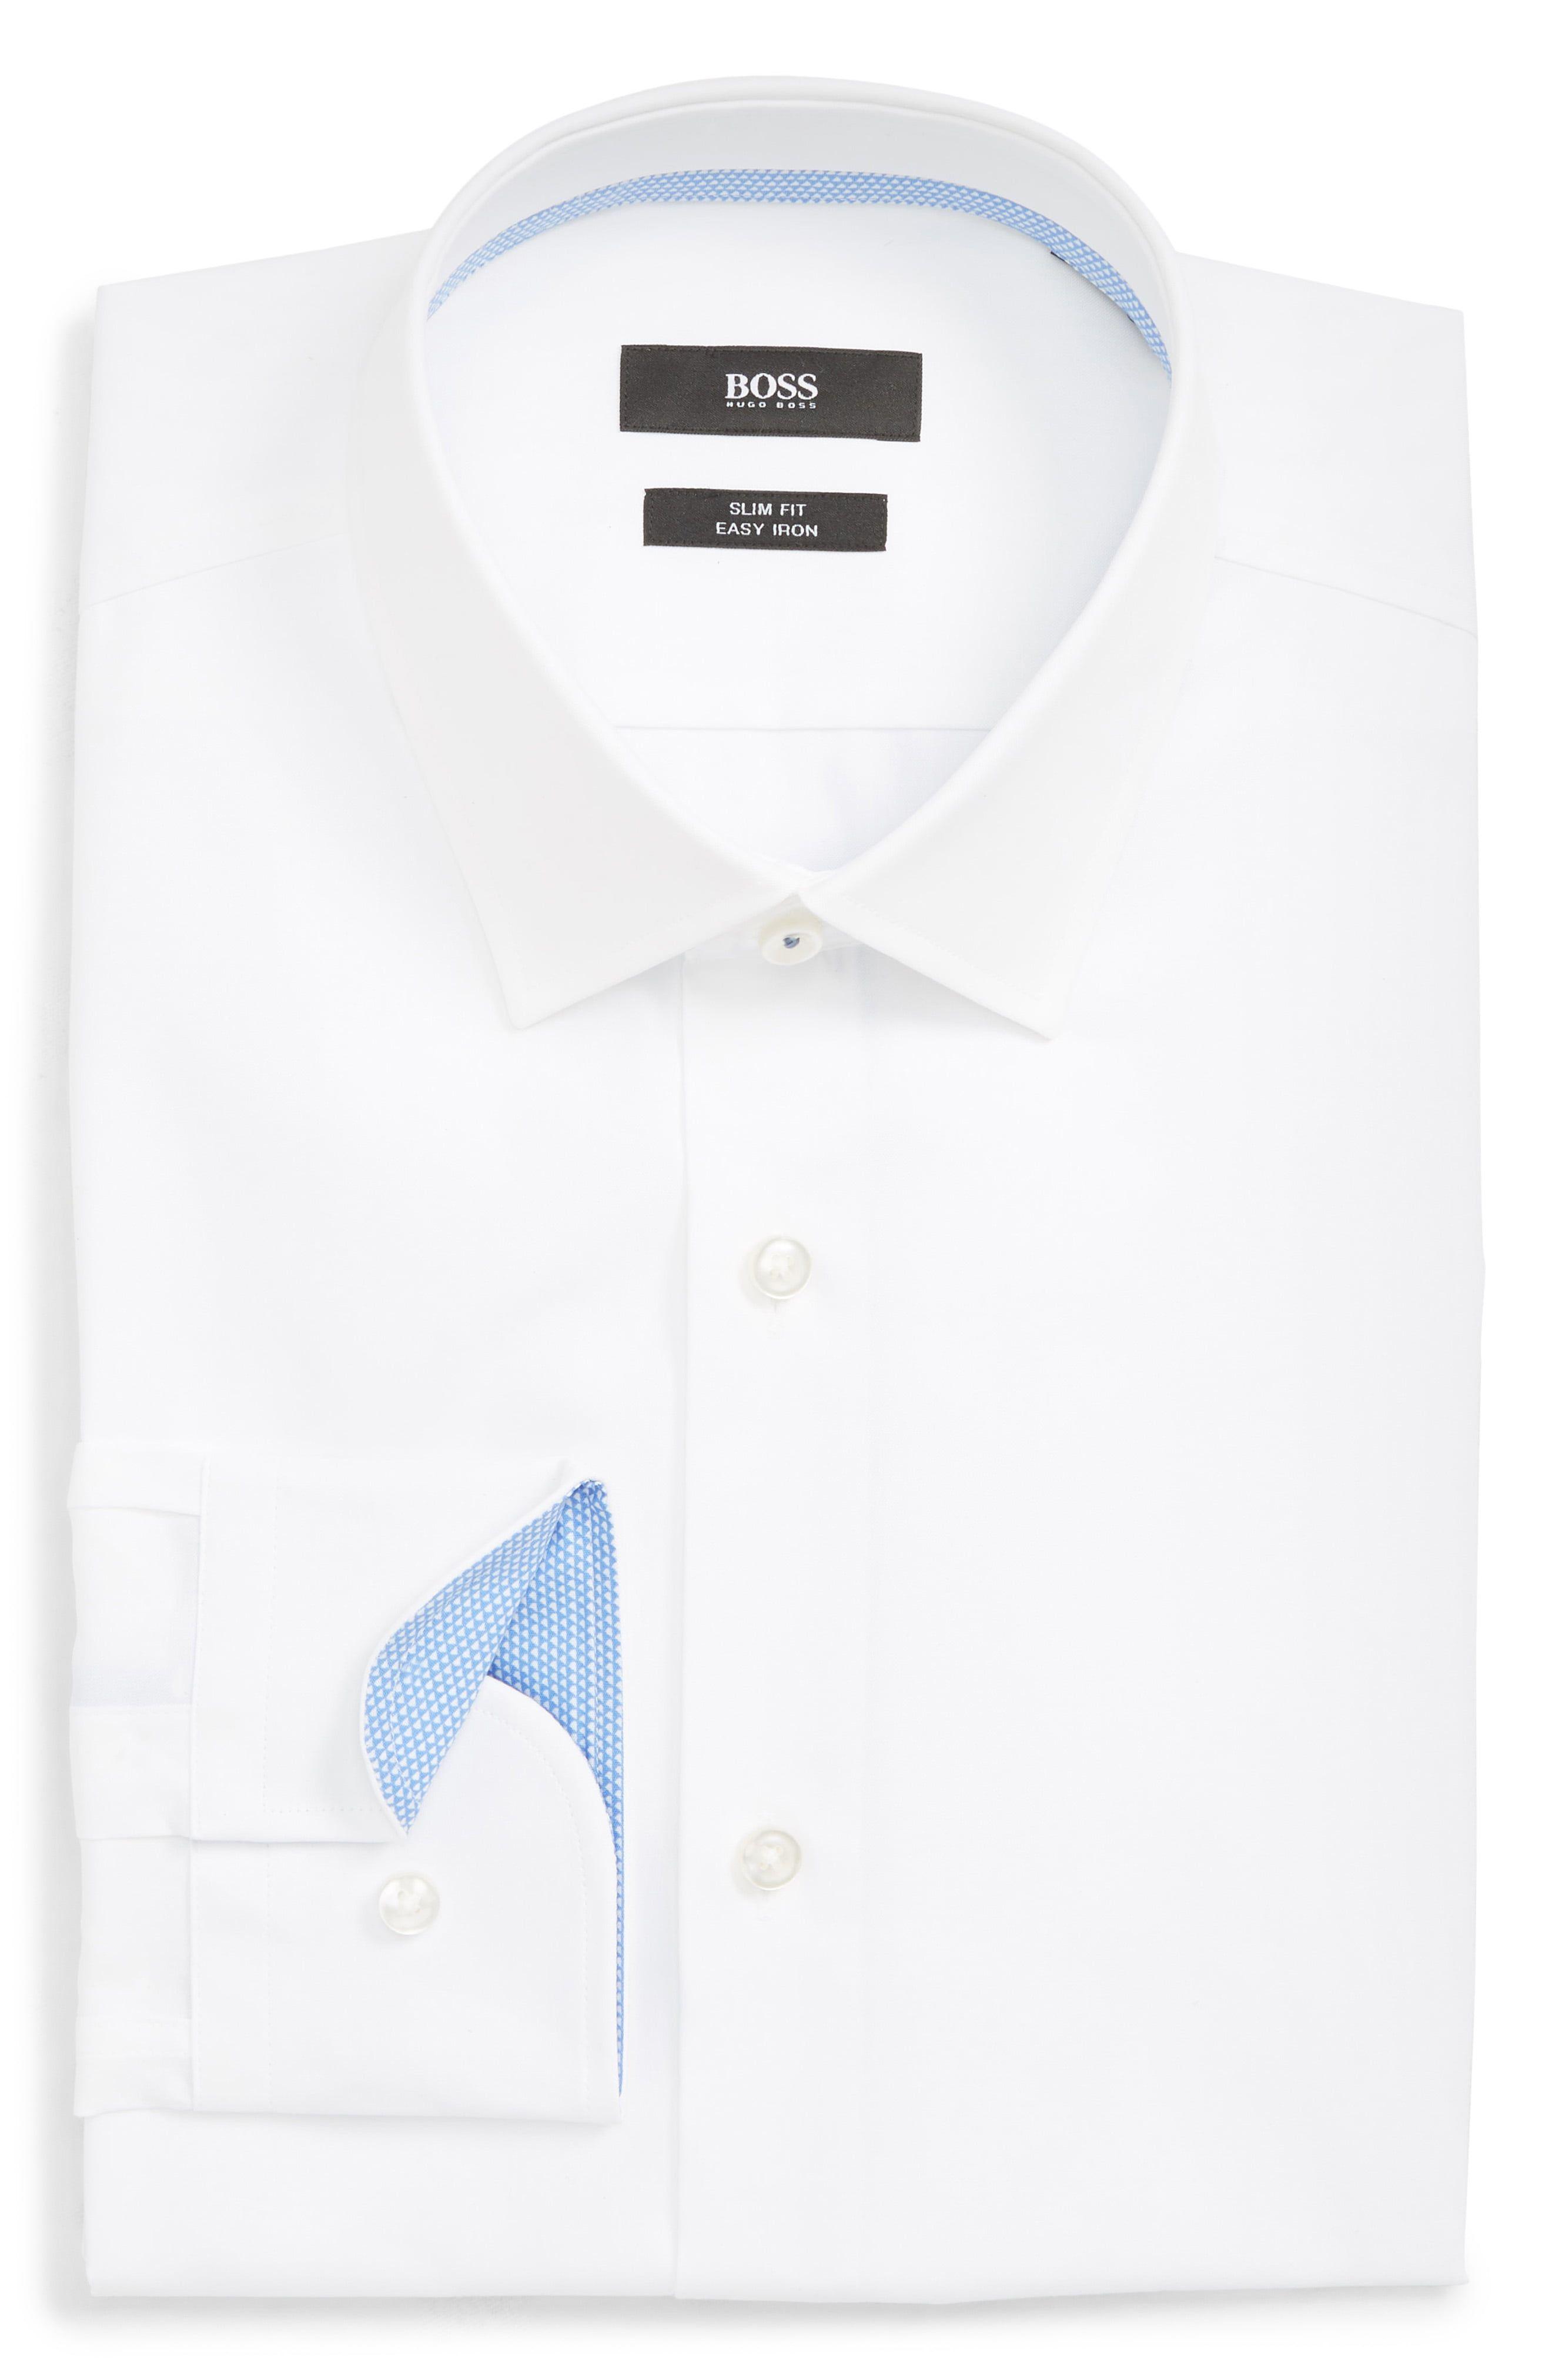 1fdbd3b03 Men's Boss Jenno Slim Fit Easy Iron Solid Dress Shirt, Size 15.5 - White